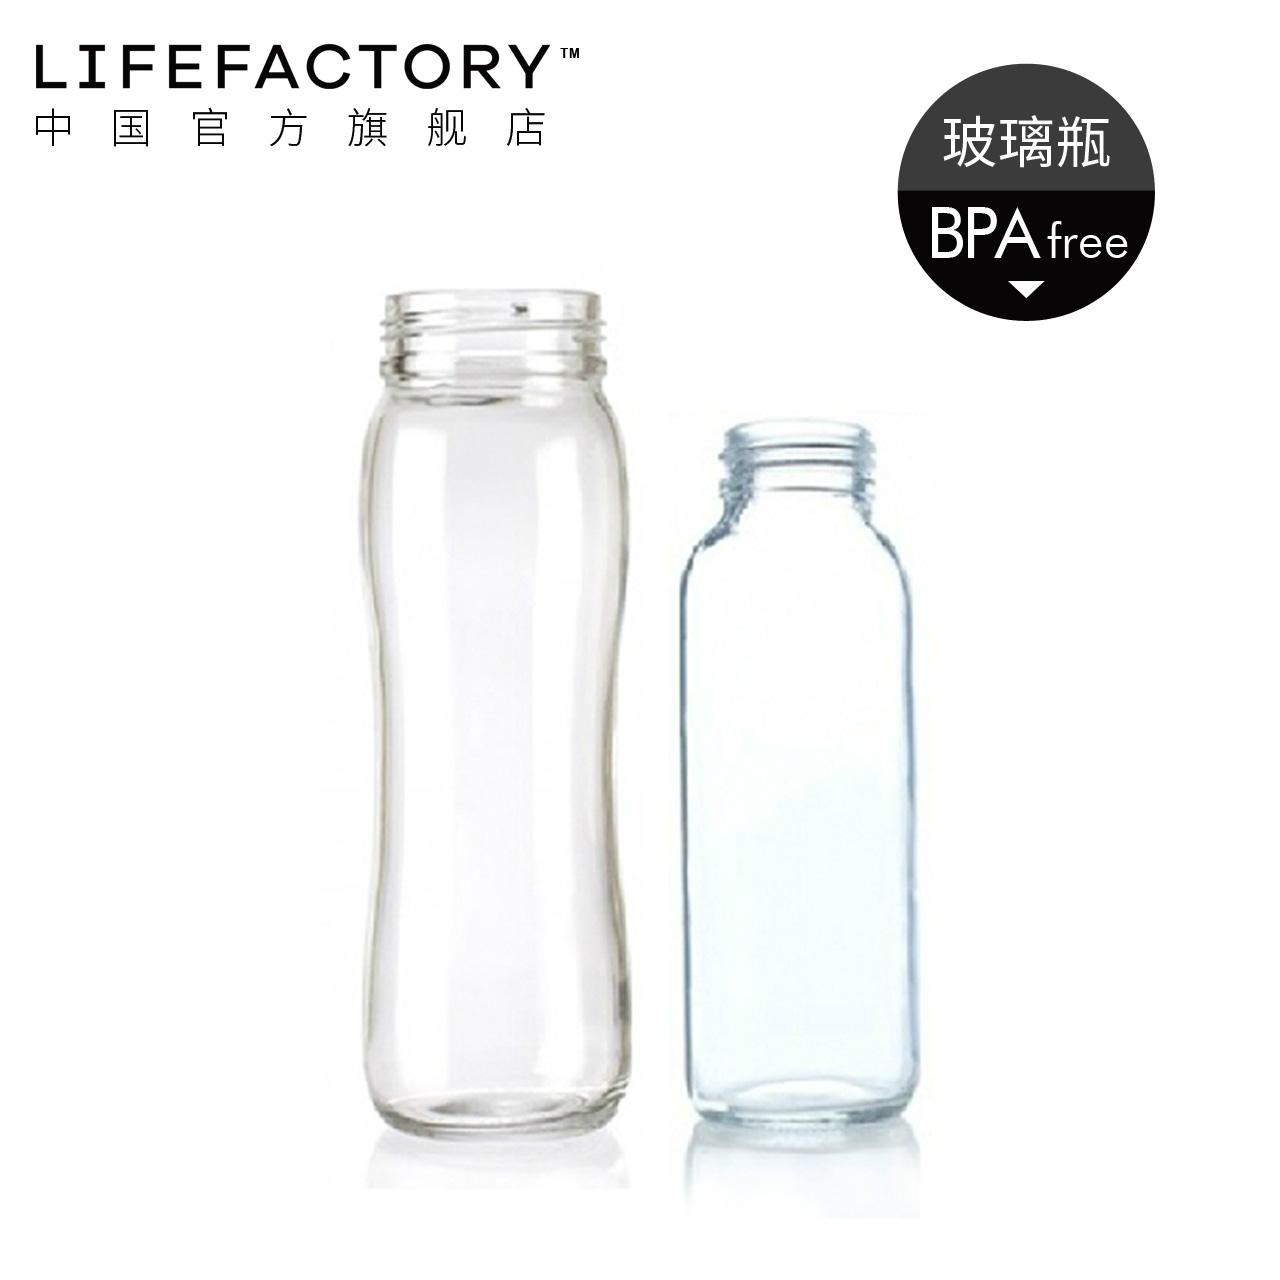 Lifefactory玻璃杯配件 120/250/350/475/650ml玻璃裸瓶無矽膠套